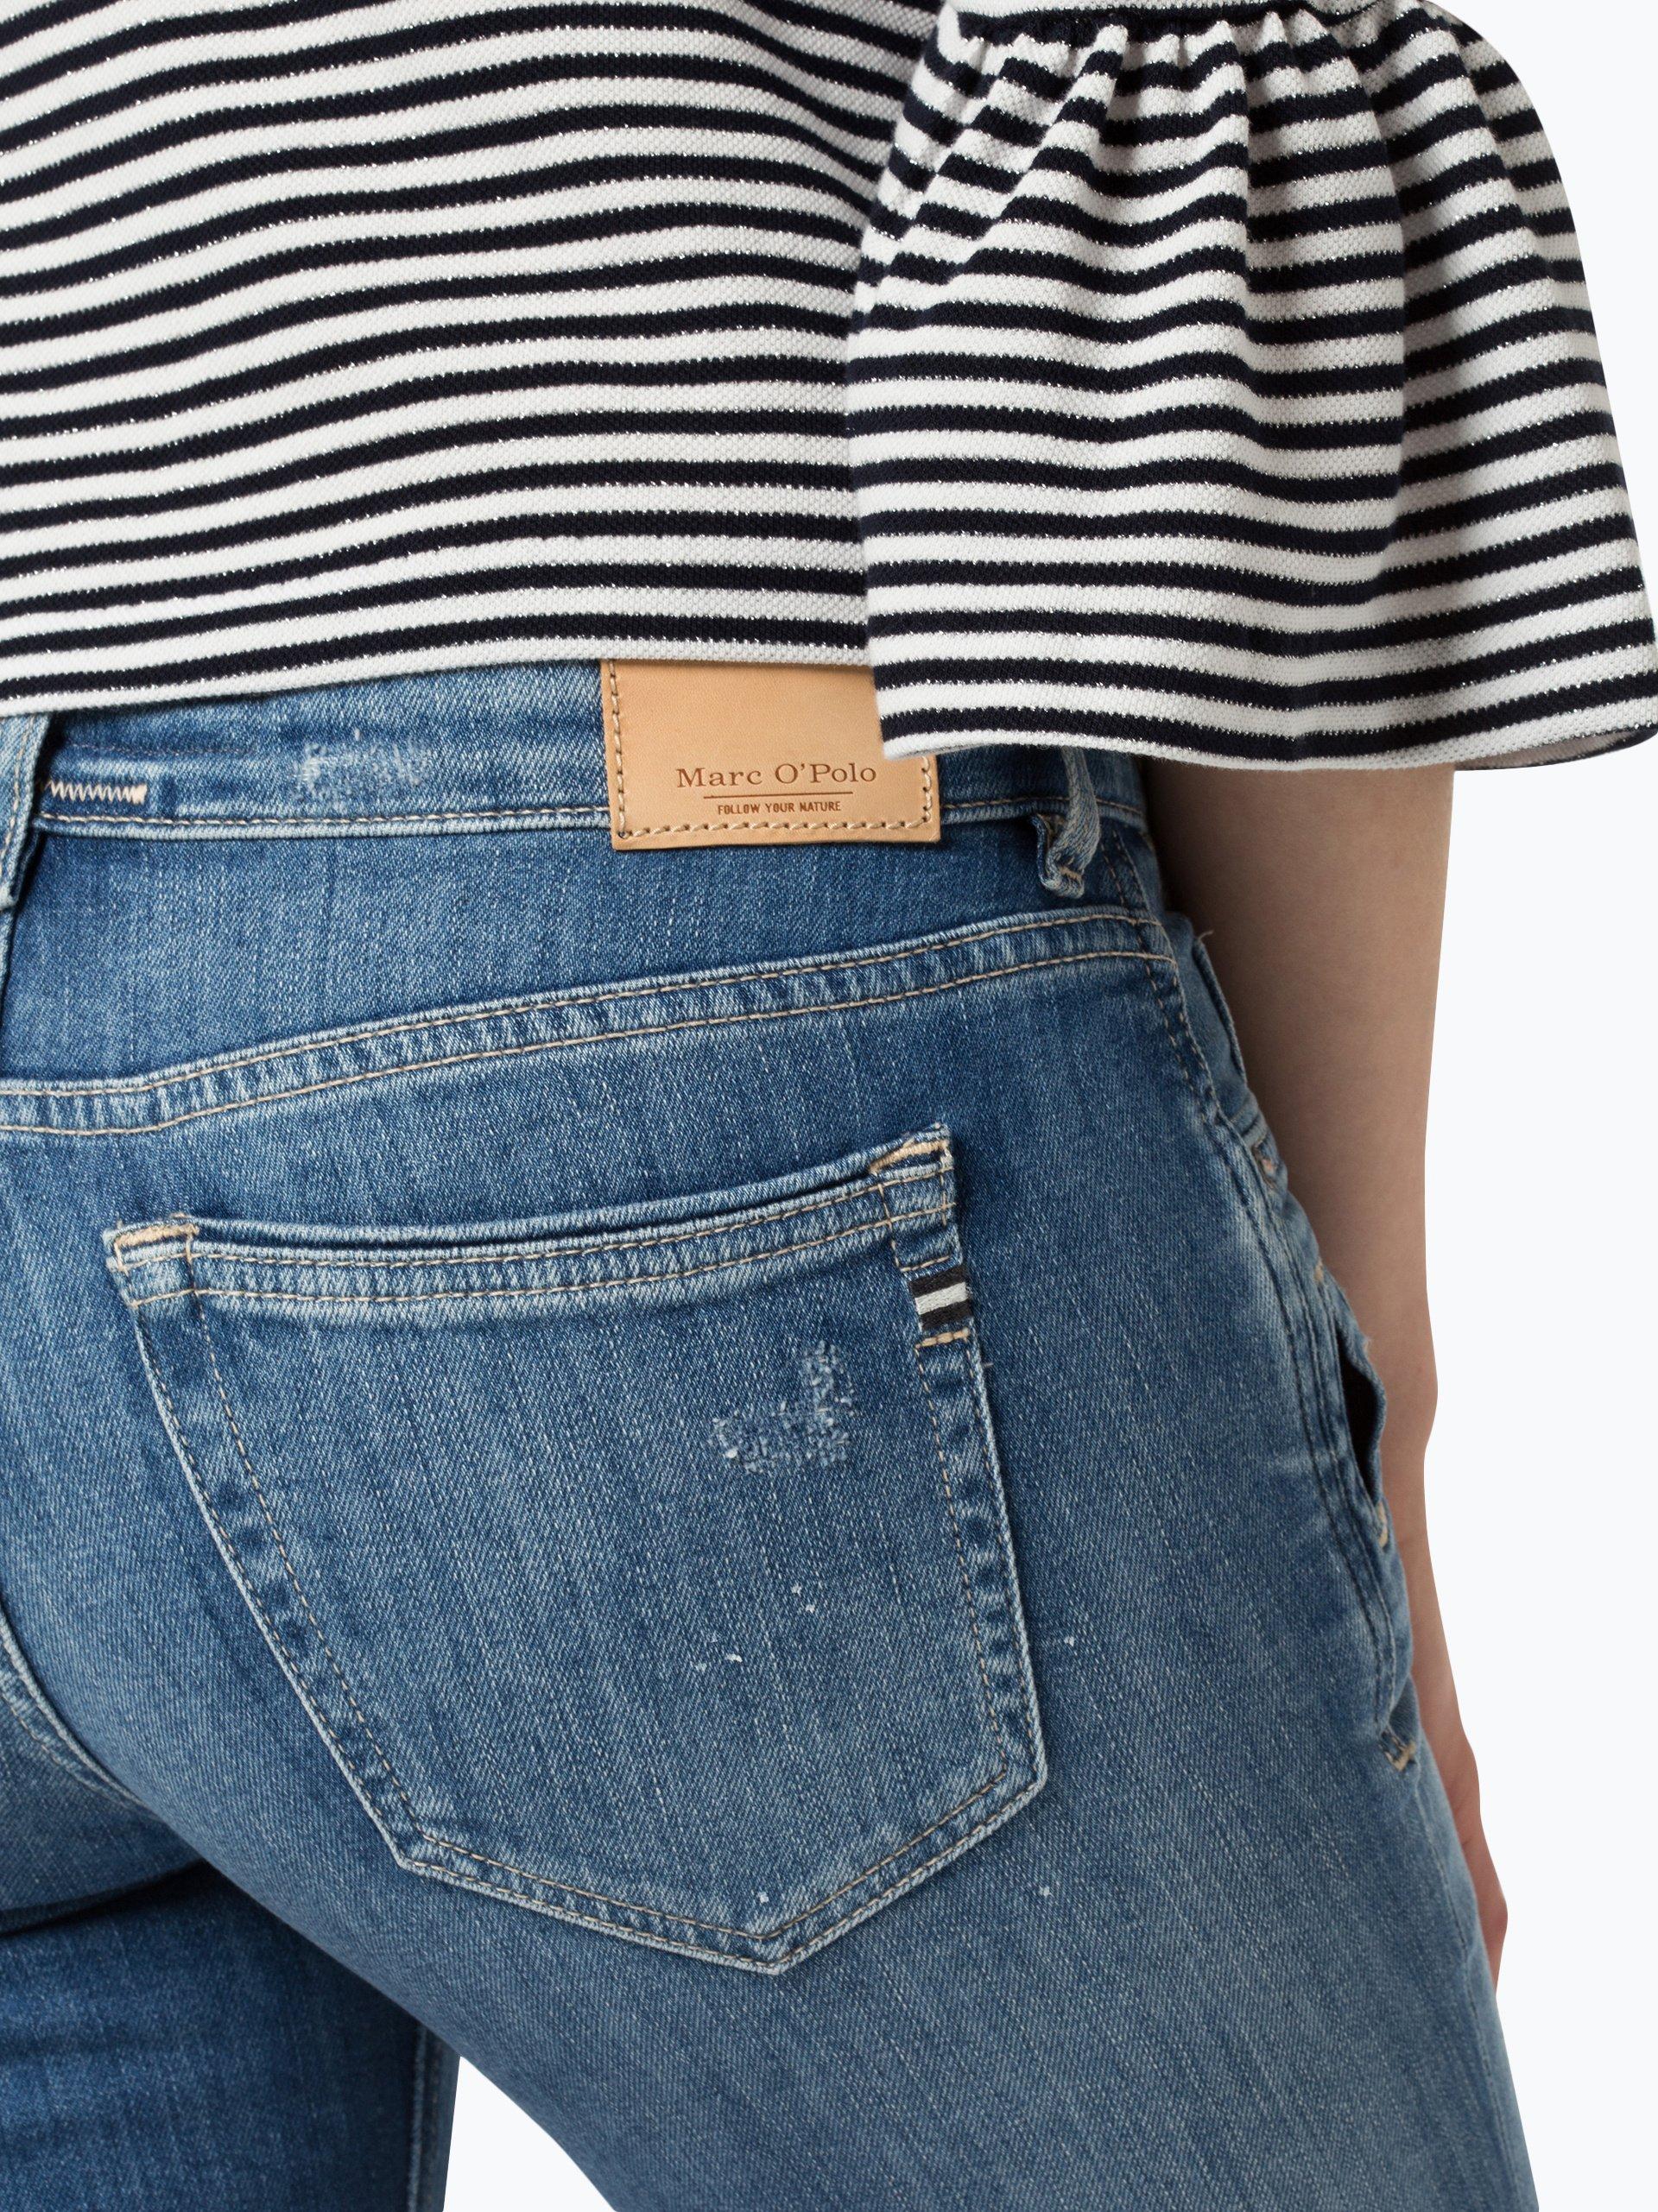 huge inventory best place meet Marc O'Polo Damen Jeans - Lulea online kaufen | VANGRAAF.COM